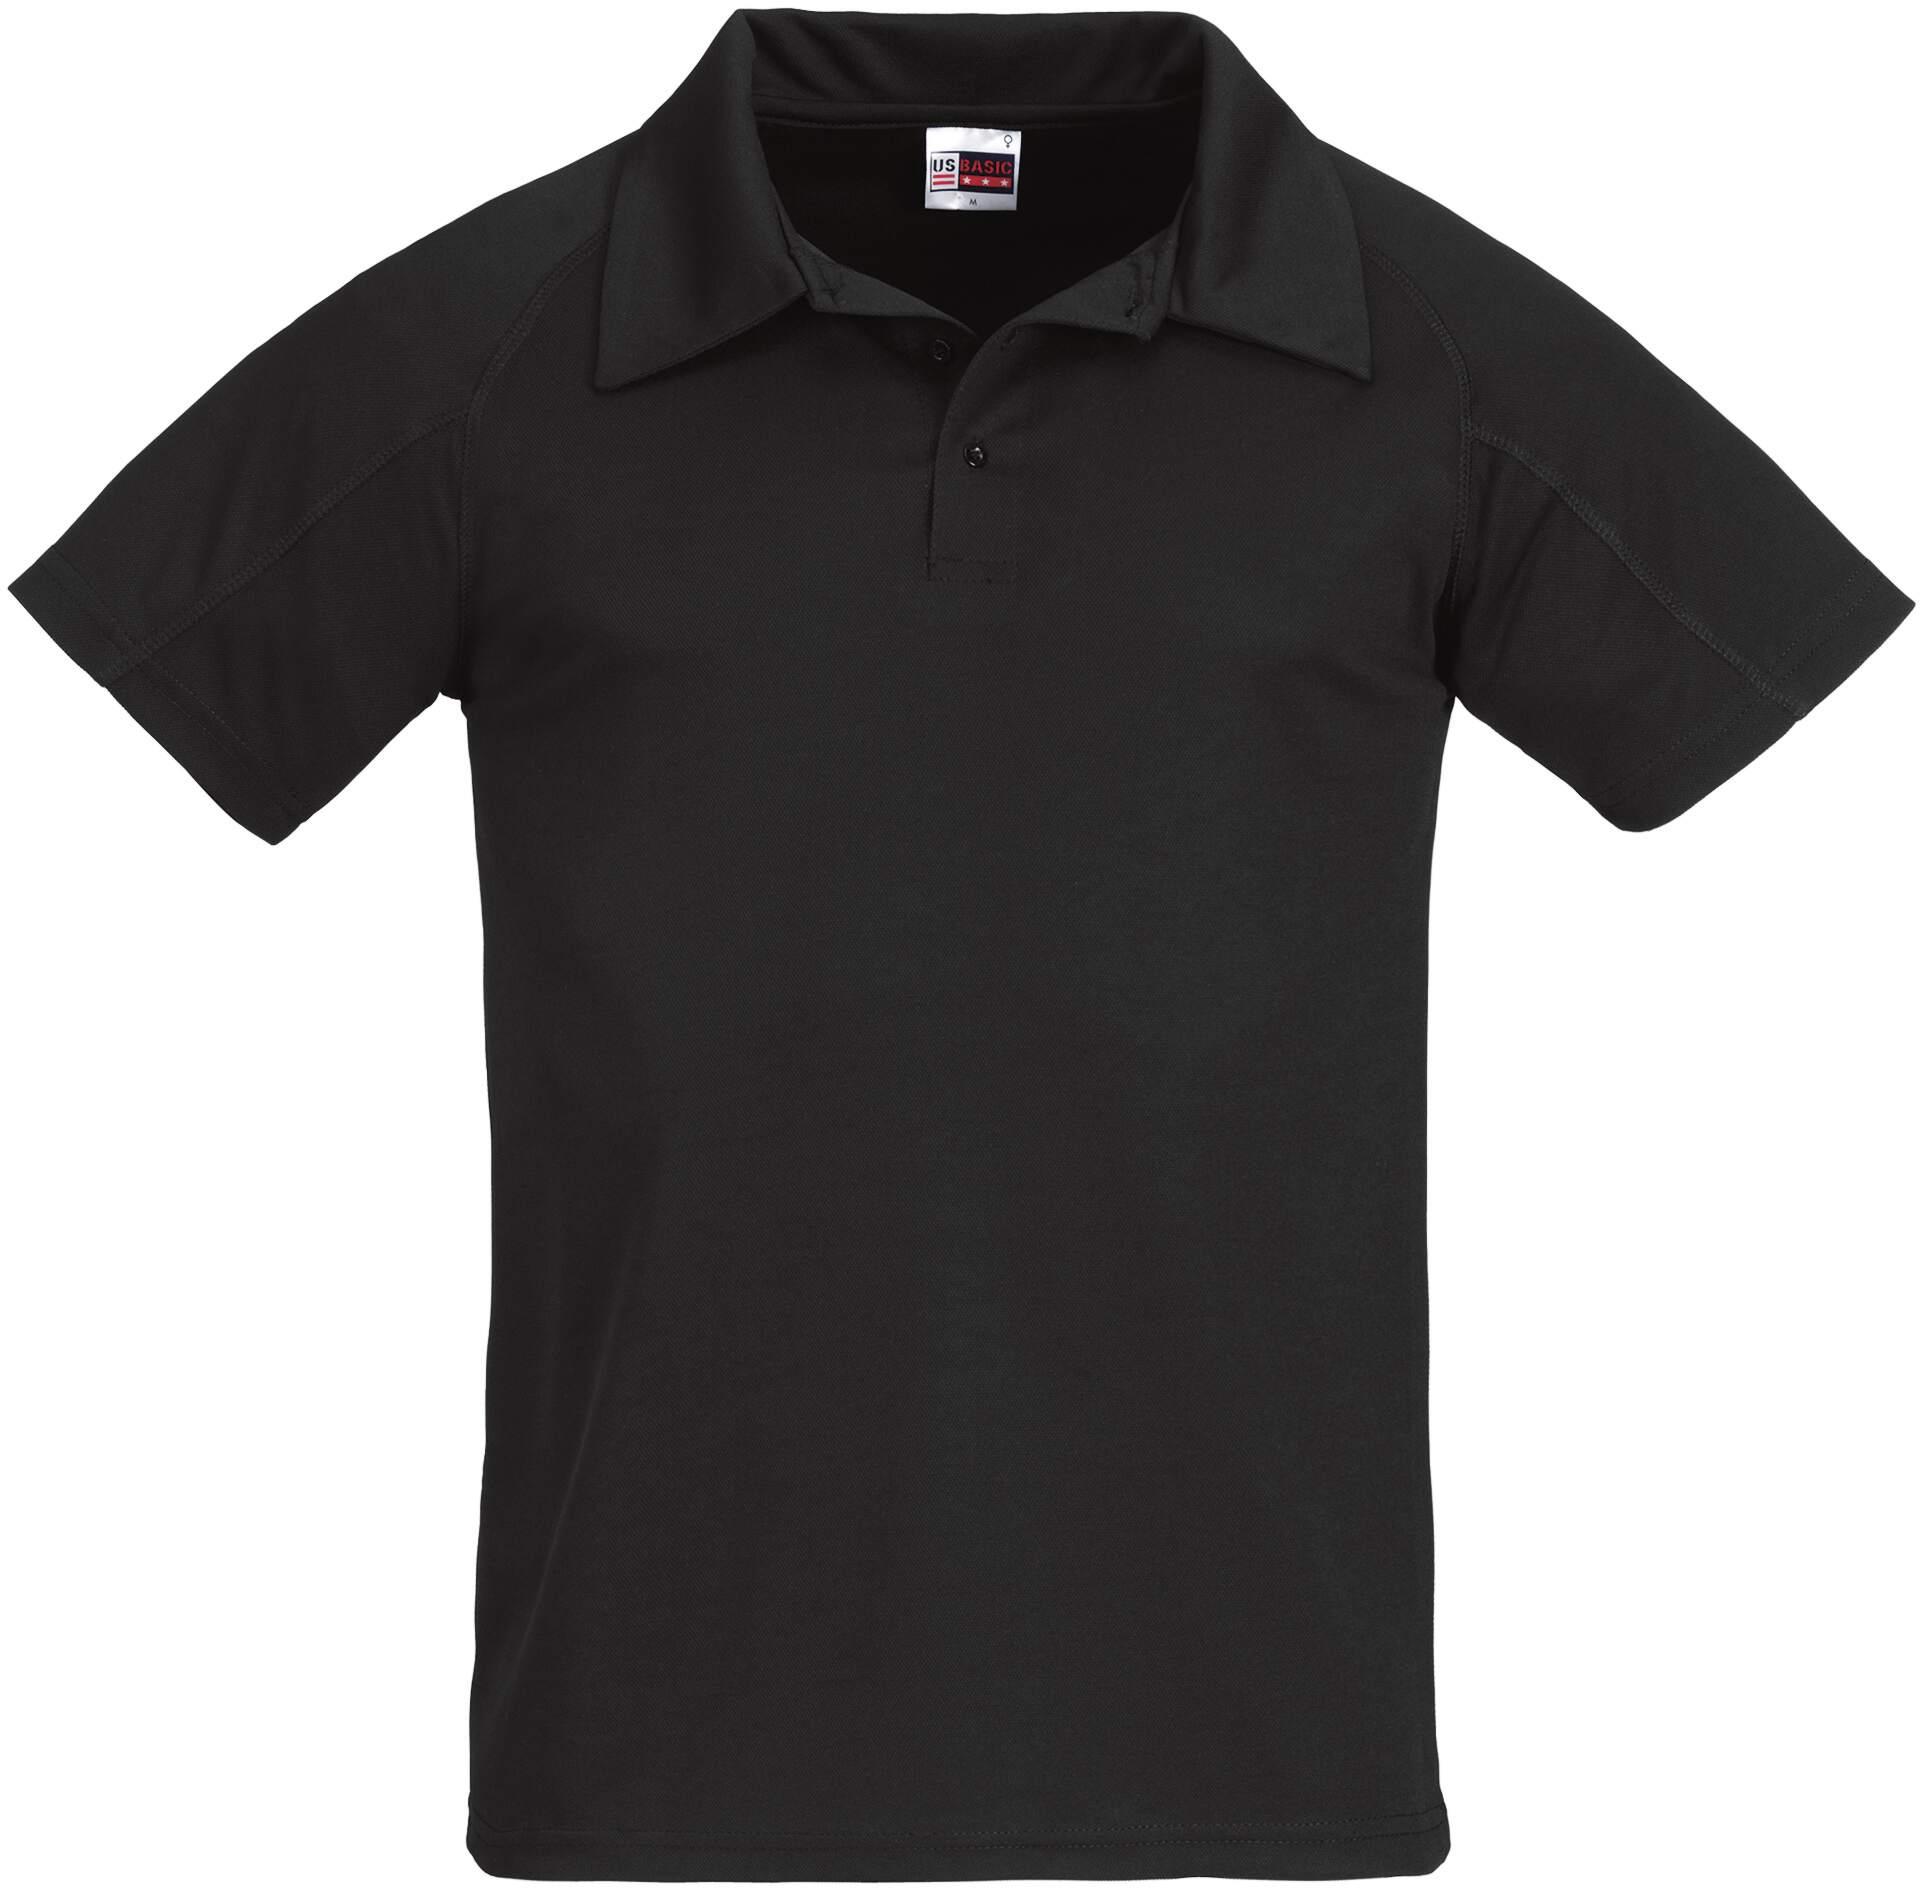 Koszulku Polo US 31098 Cool Fit - 31098_czarny_US - Kolor: Czarny